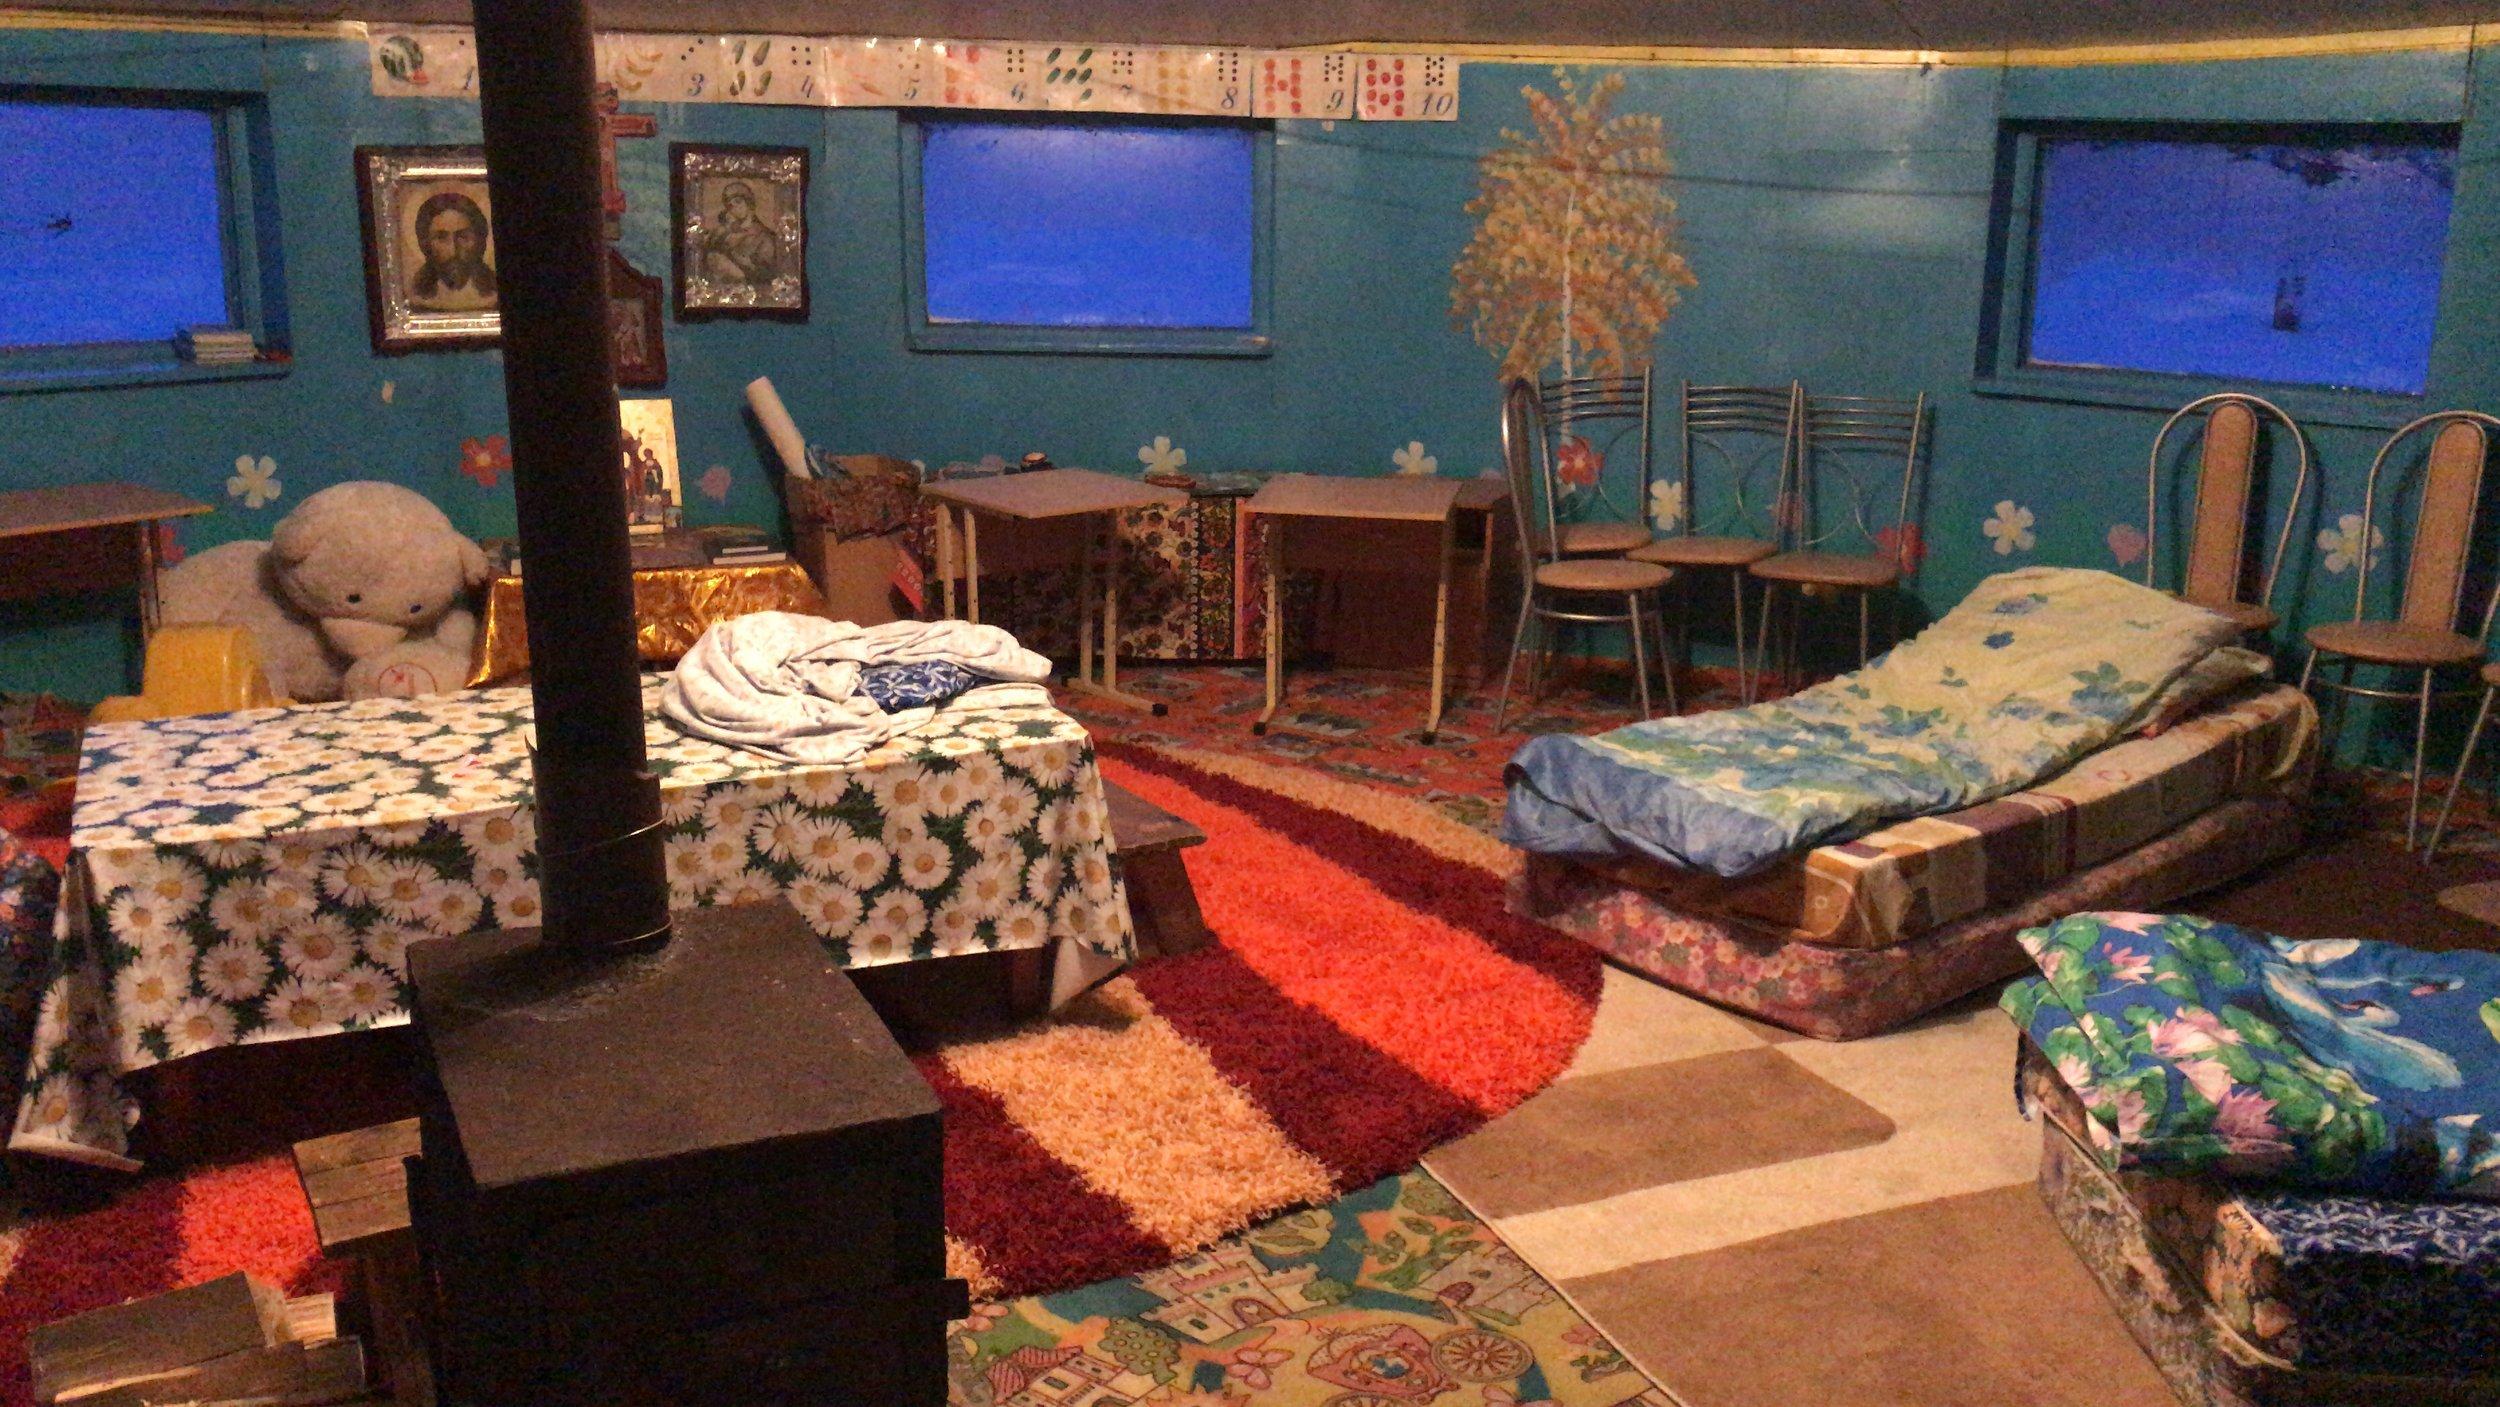 Sleeping accommodations, last night at Nenets.